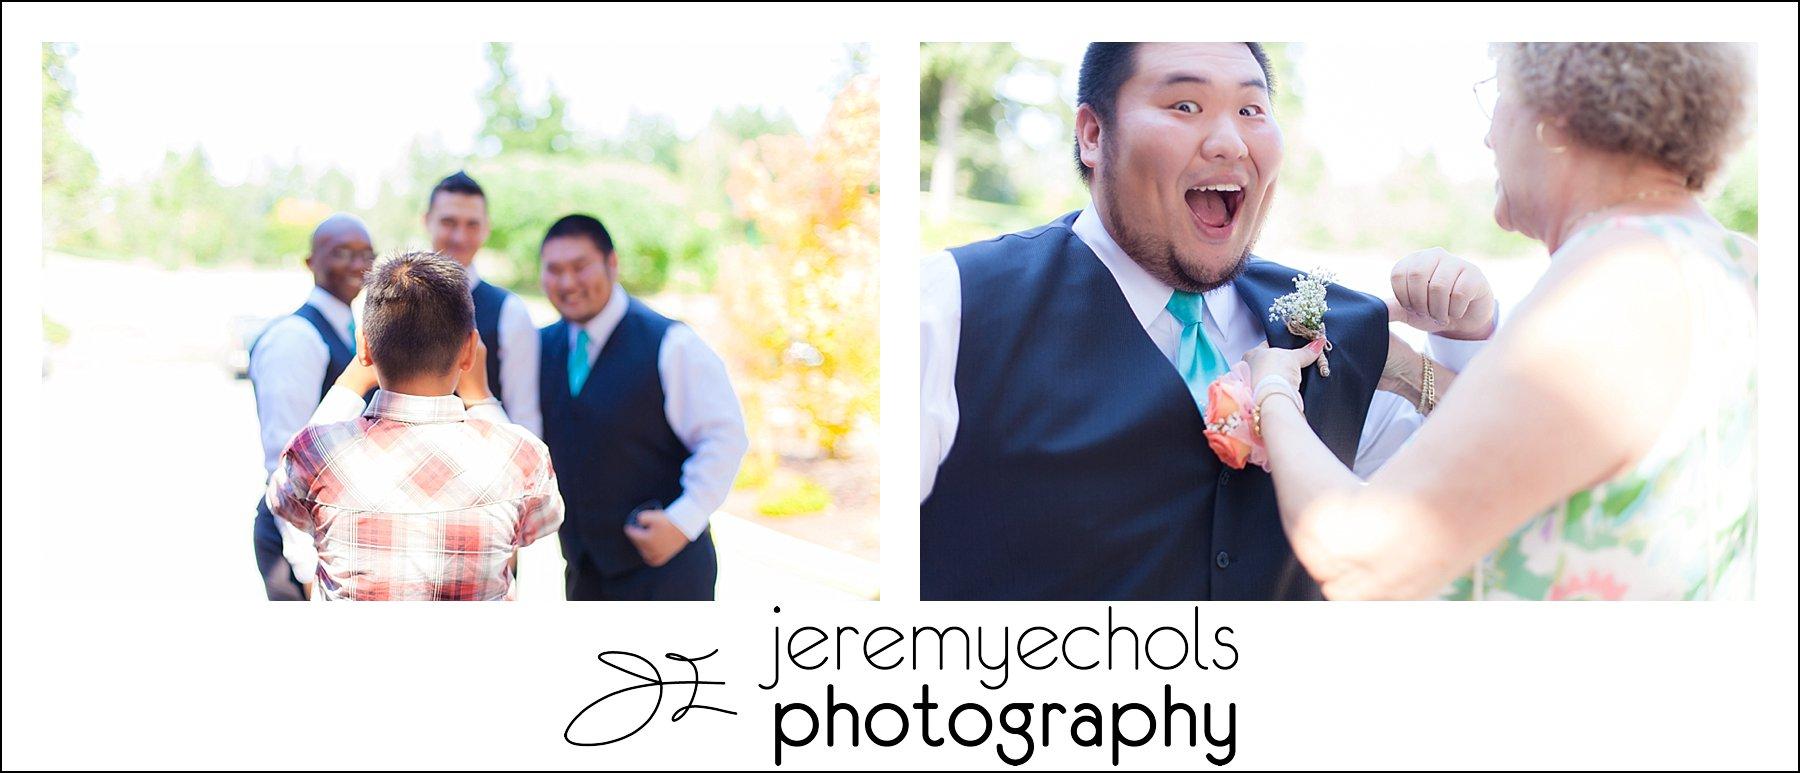 Carley-Corey-Seattle-Wedding-Photography-334_WEB.jpg